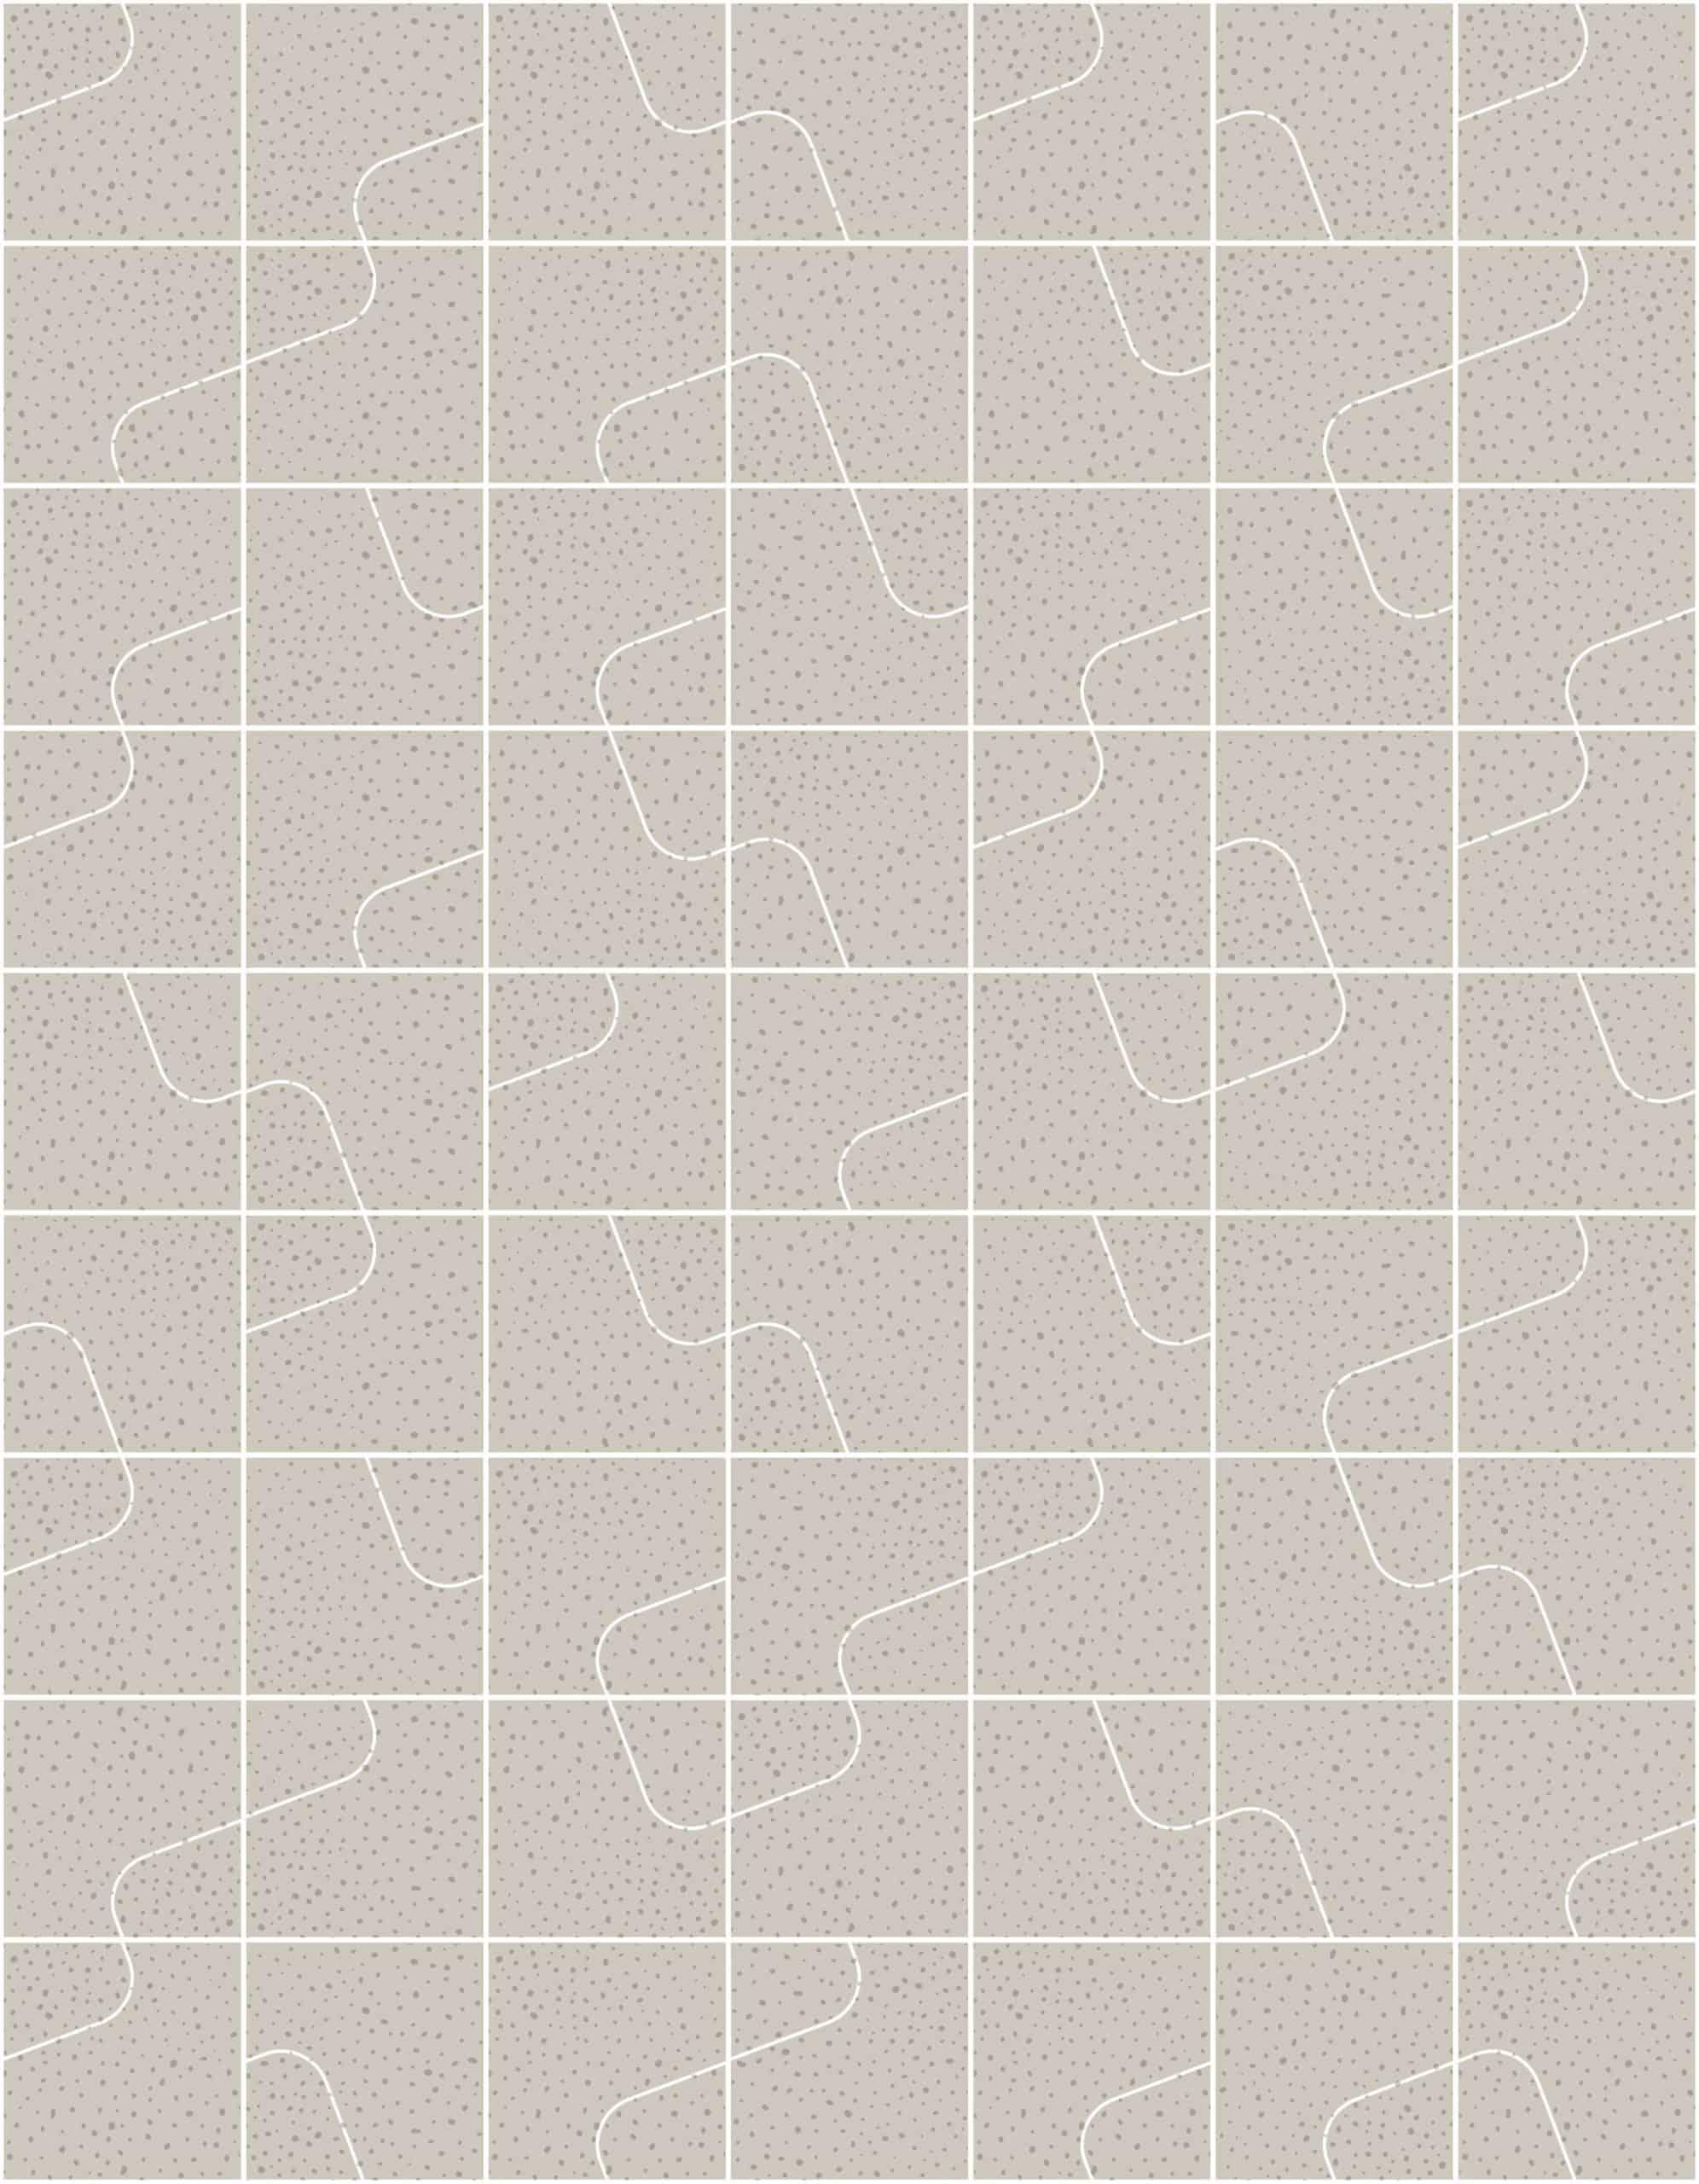 Quilt Chalk Raw Tiles